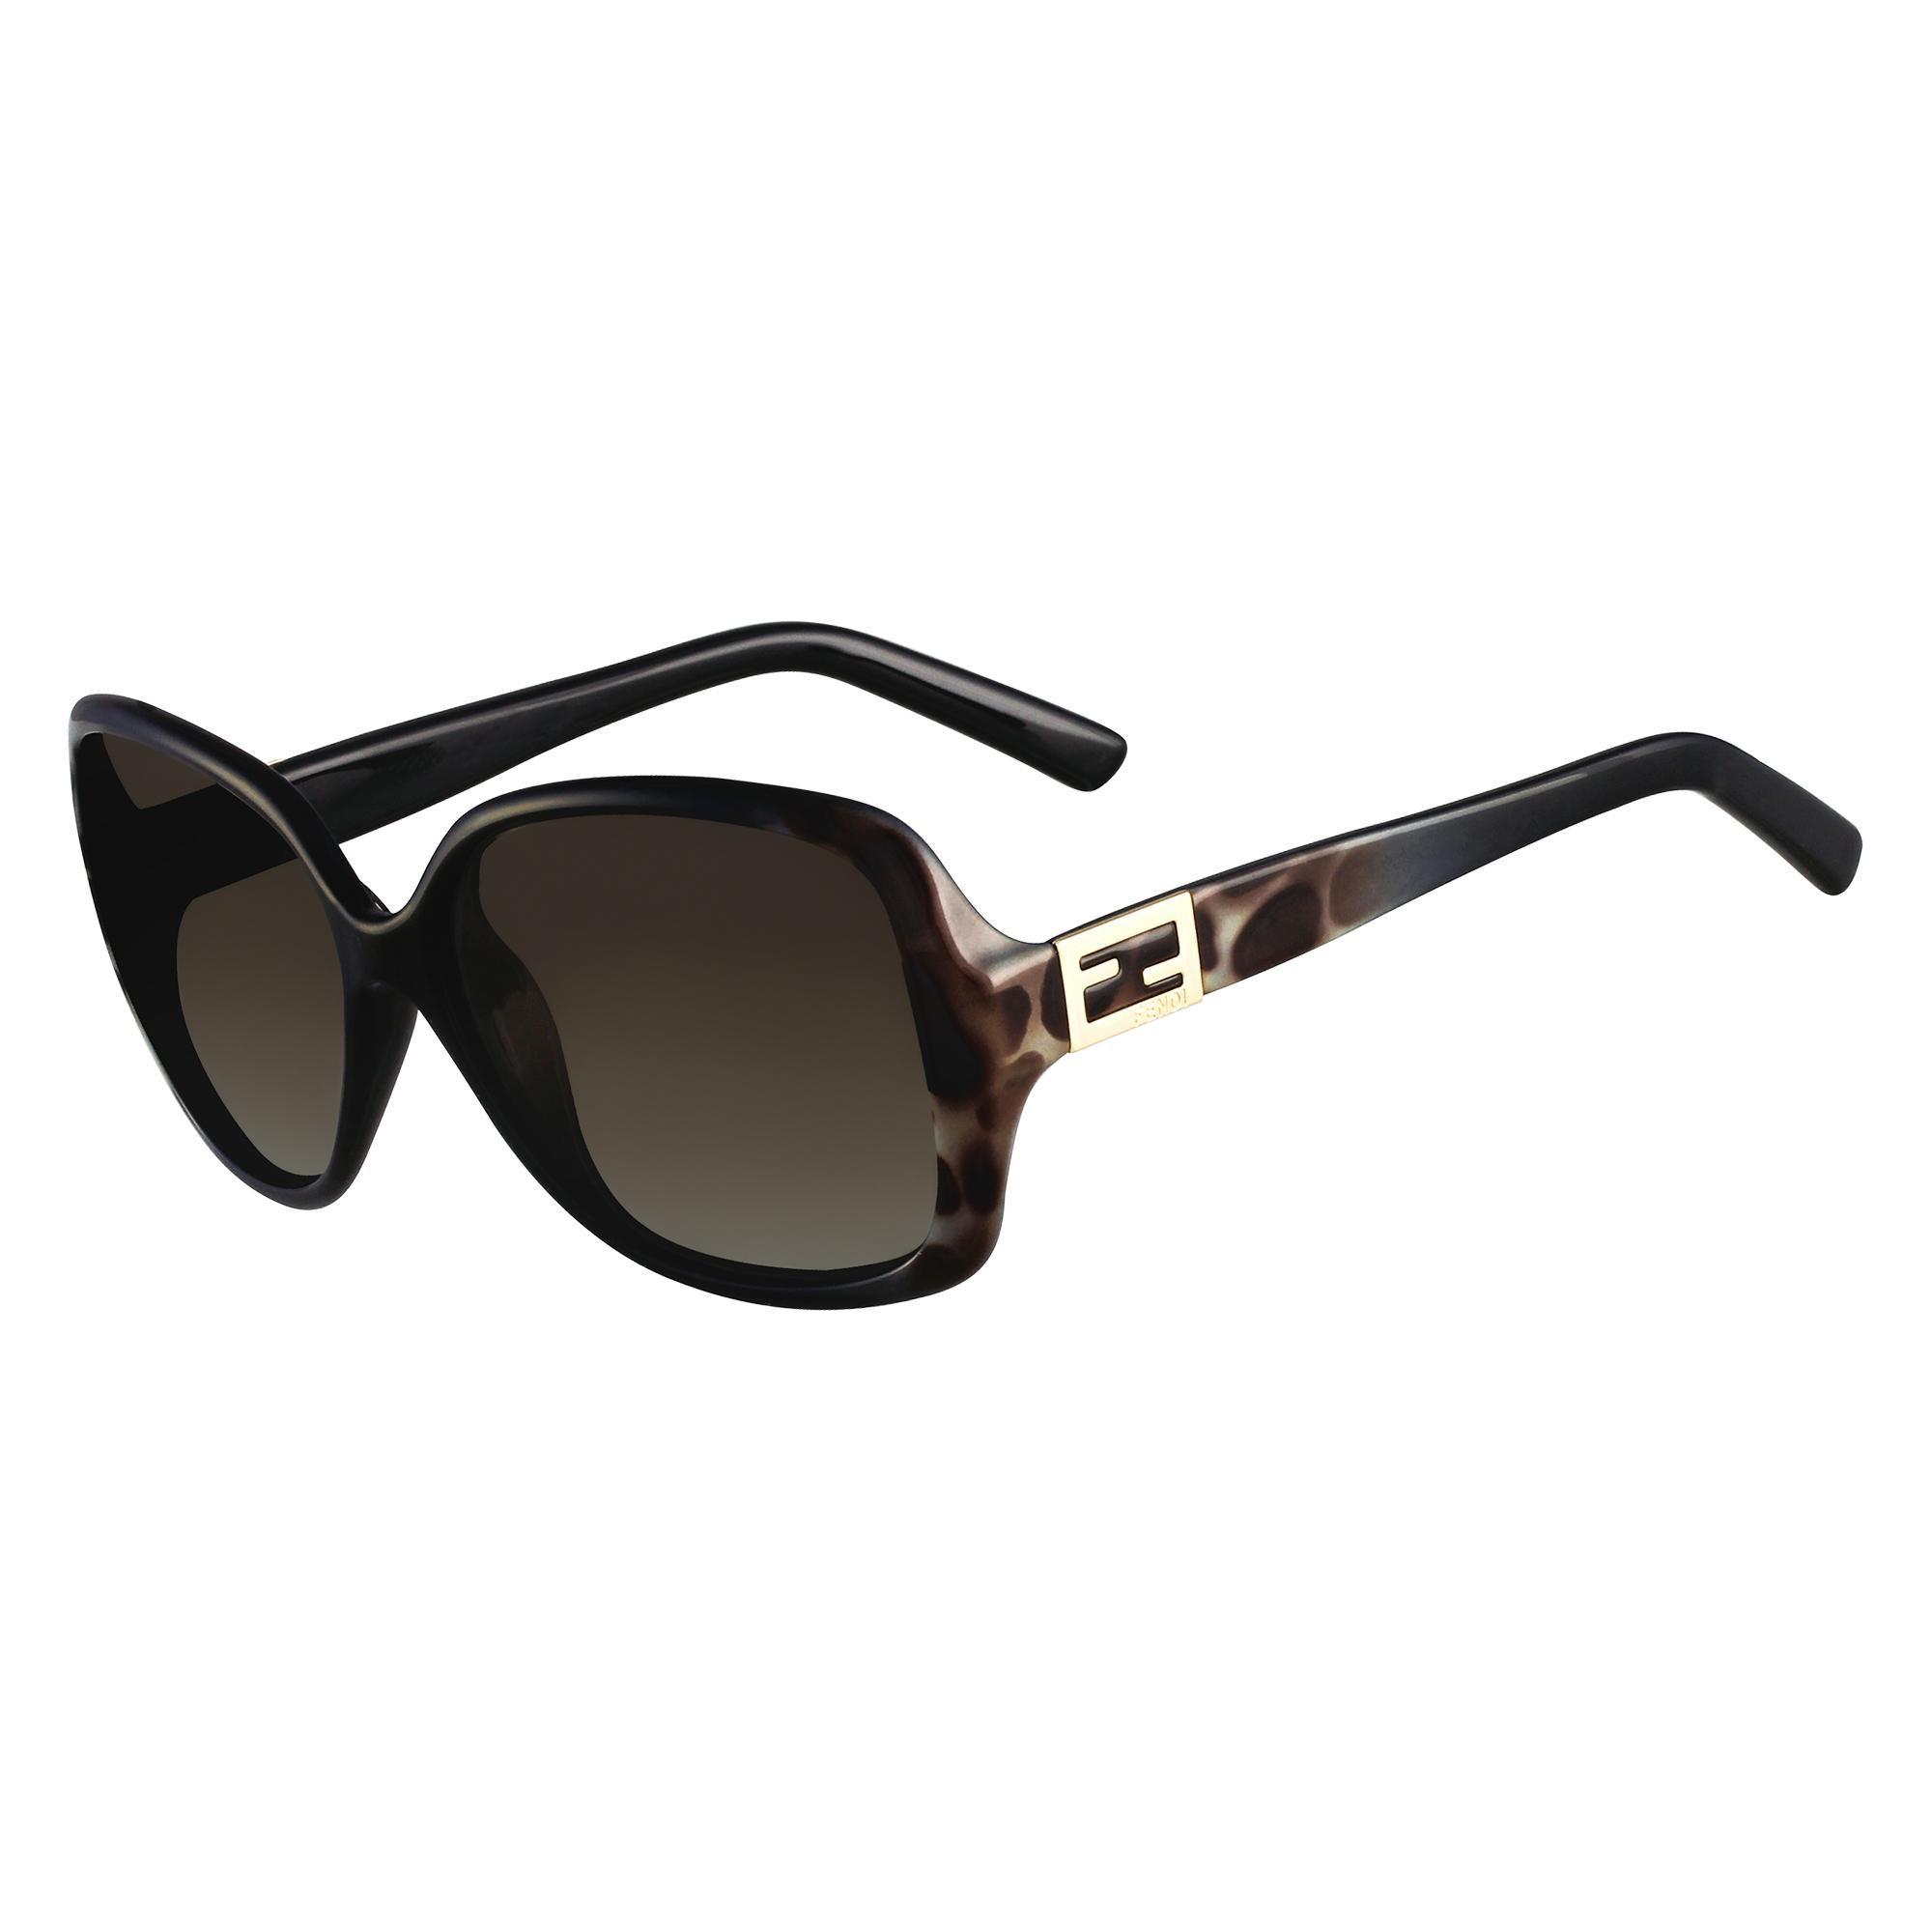 319bf1b2f1 Fendi Sunglasses - FS5227 002 56-15